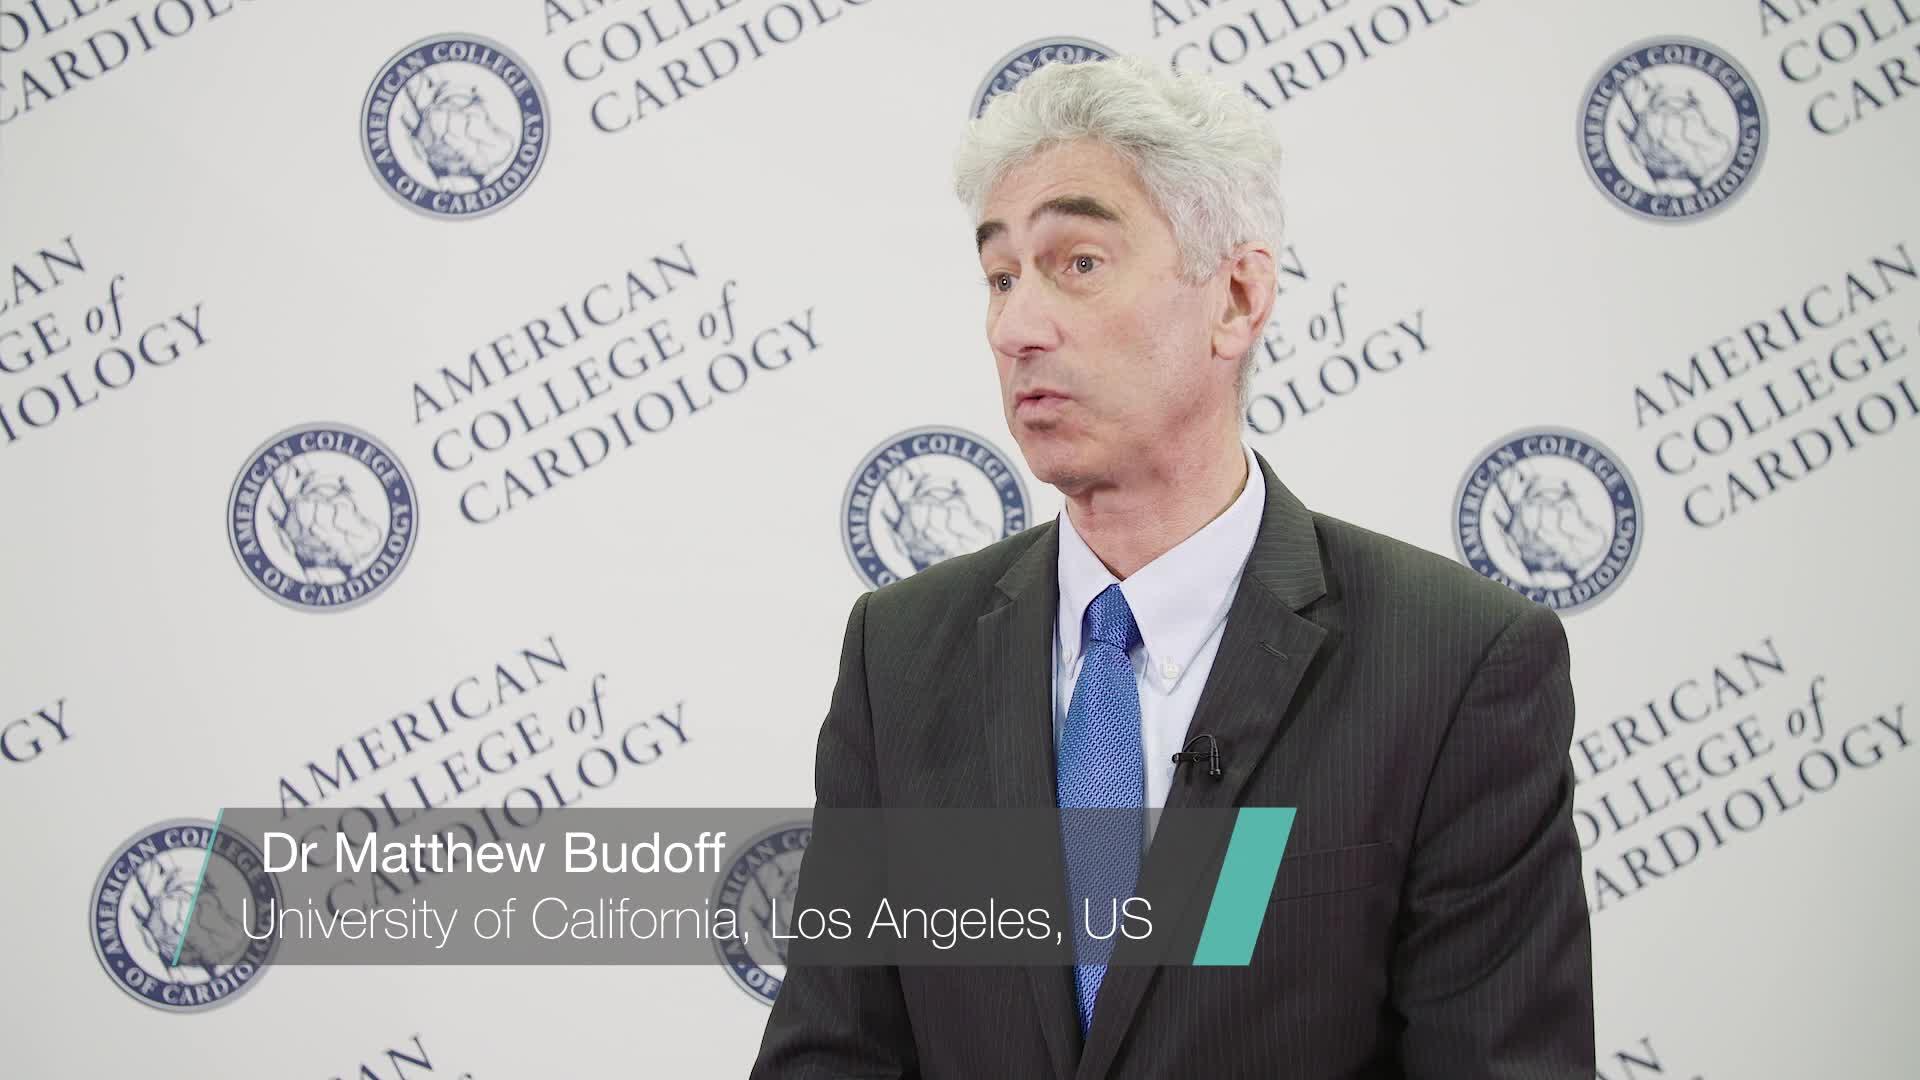 ACC 2019: REDUCE-IT - Dr Matthew Budoff | RadcliffeCardiology